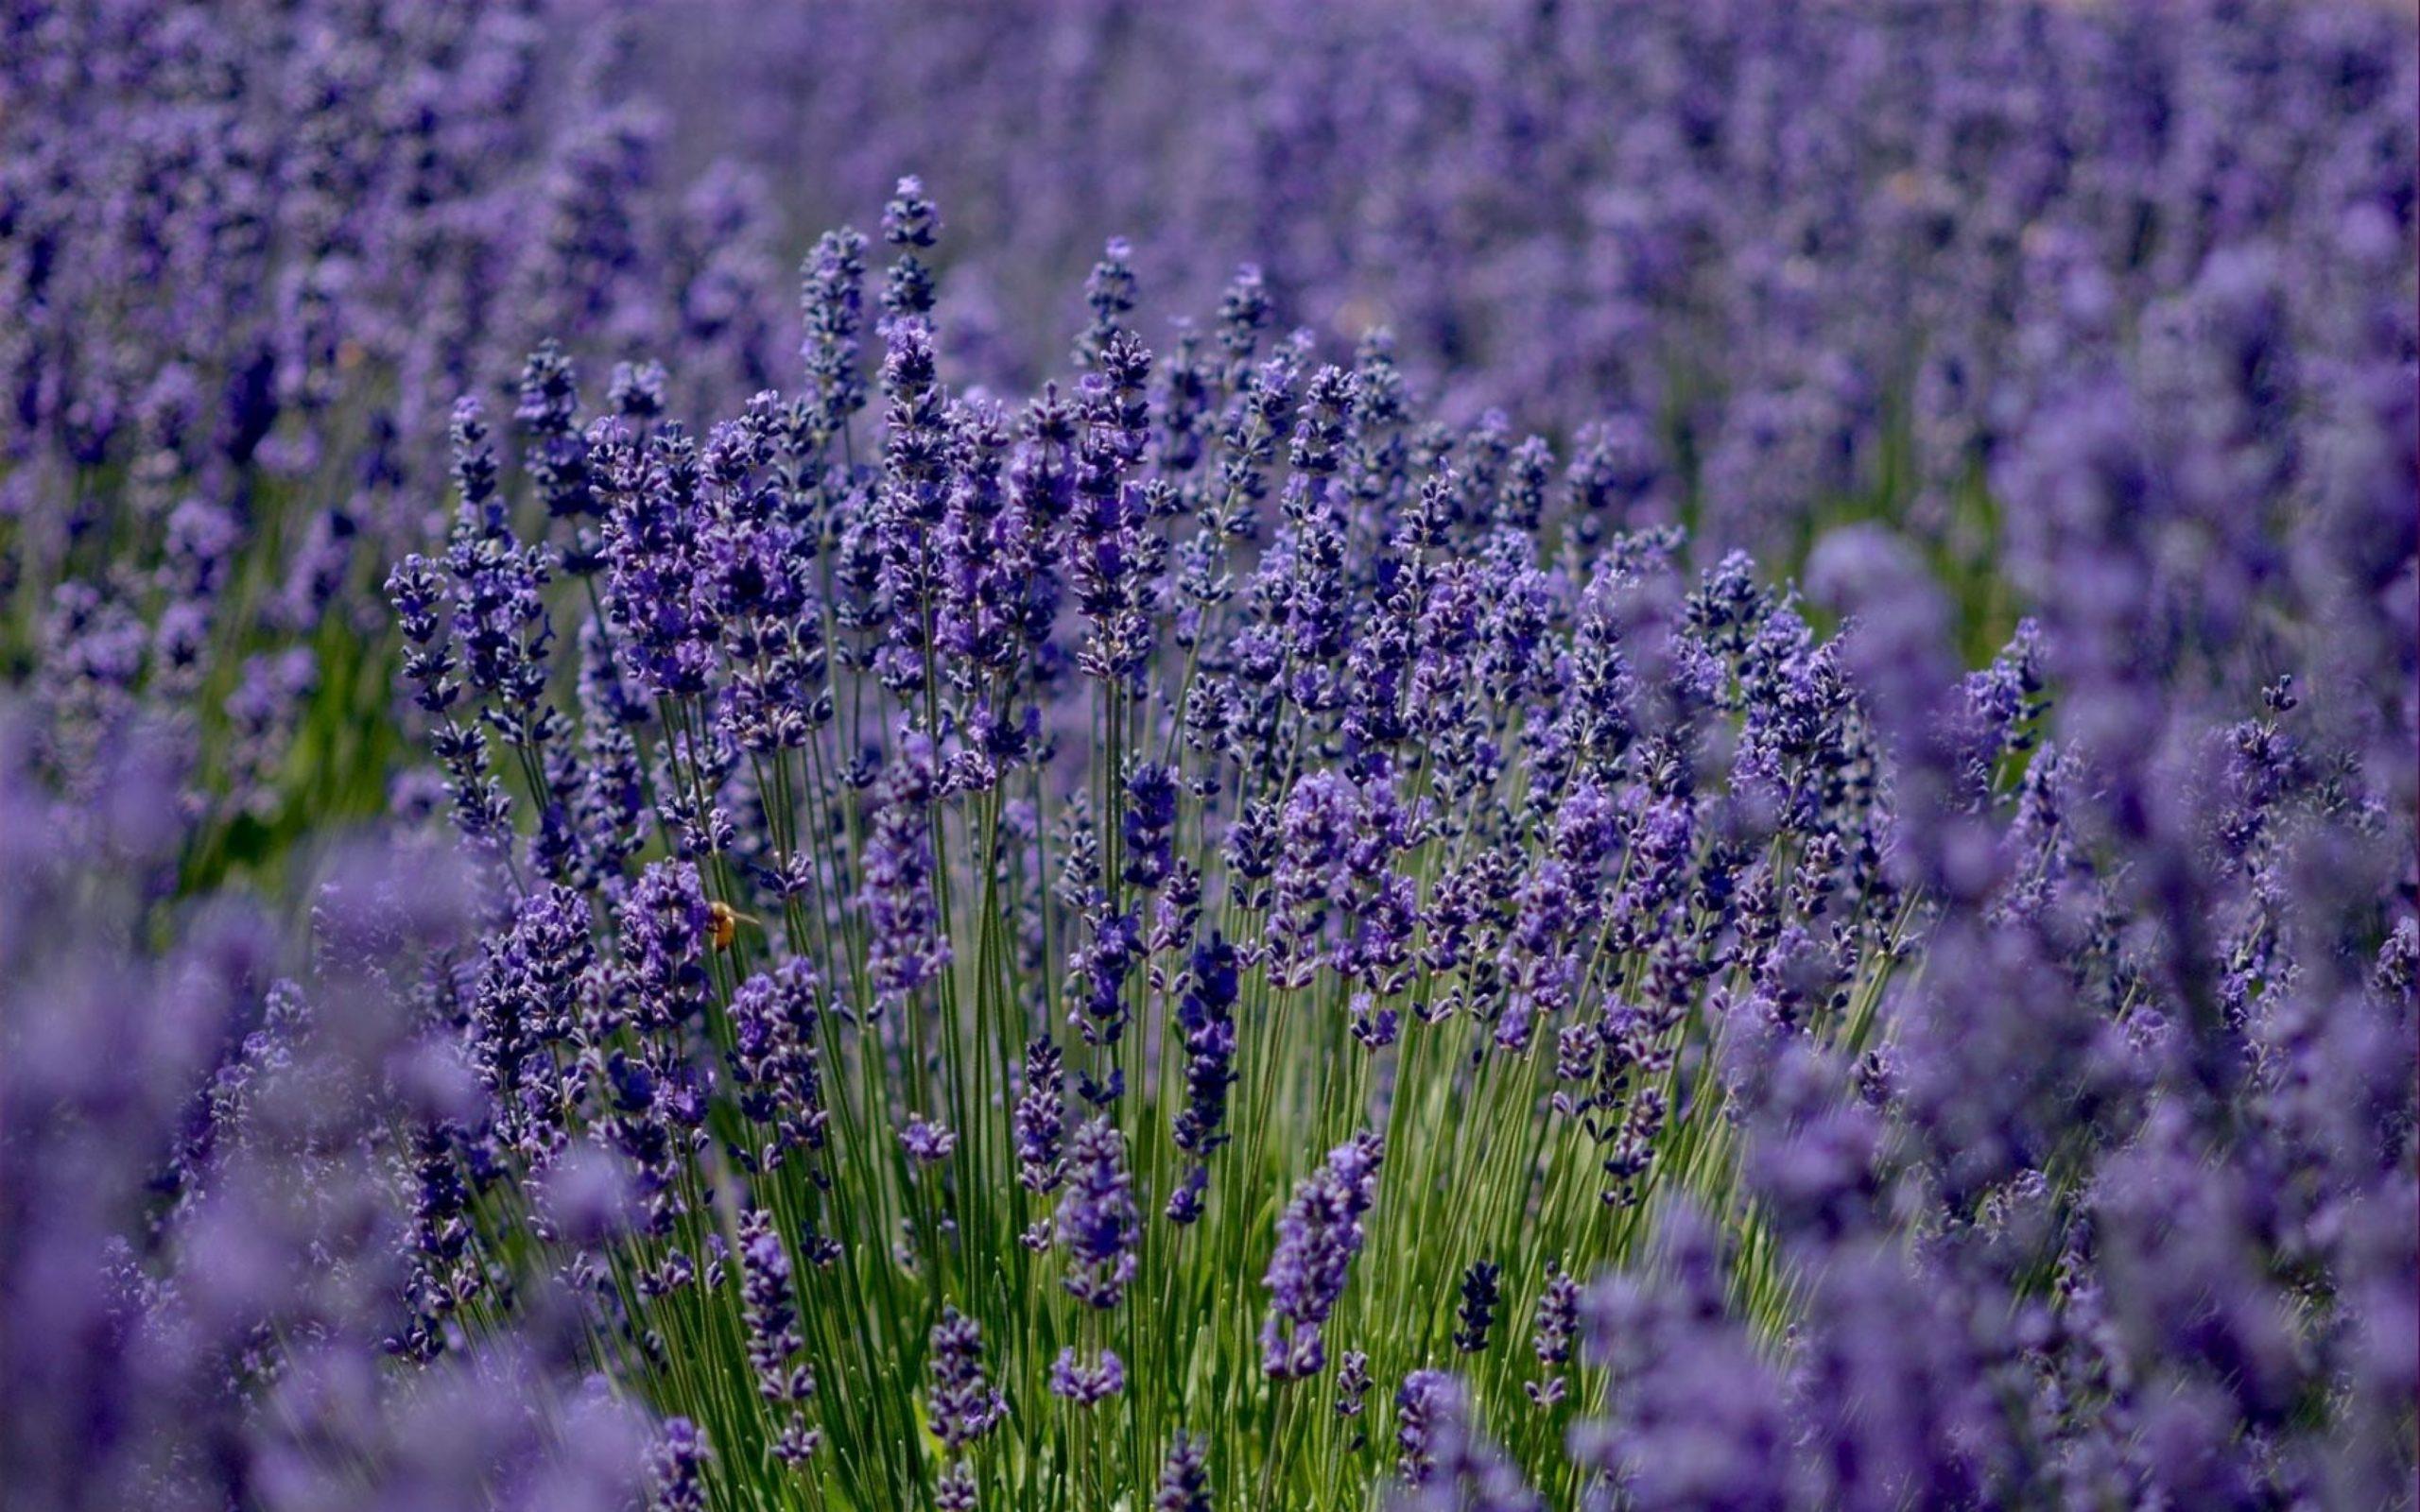 lavender_field_sharpness_52377_3840x2400